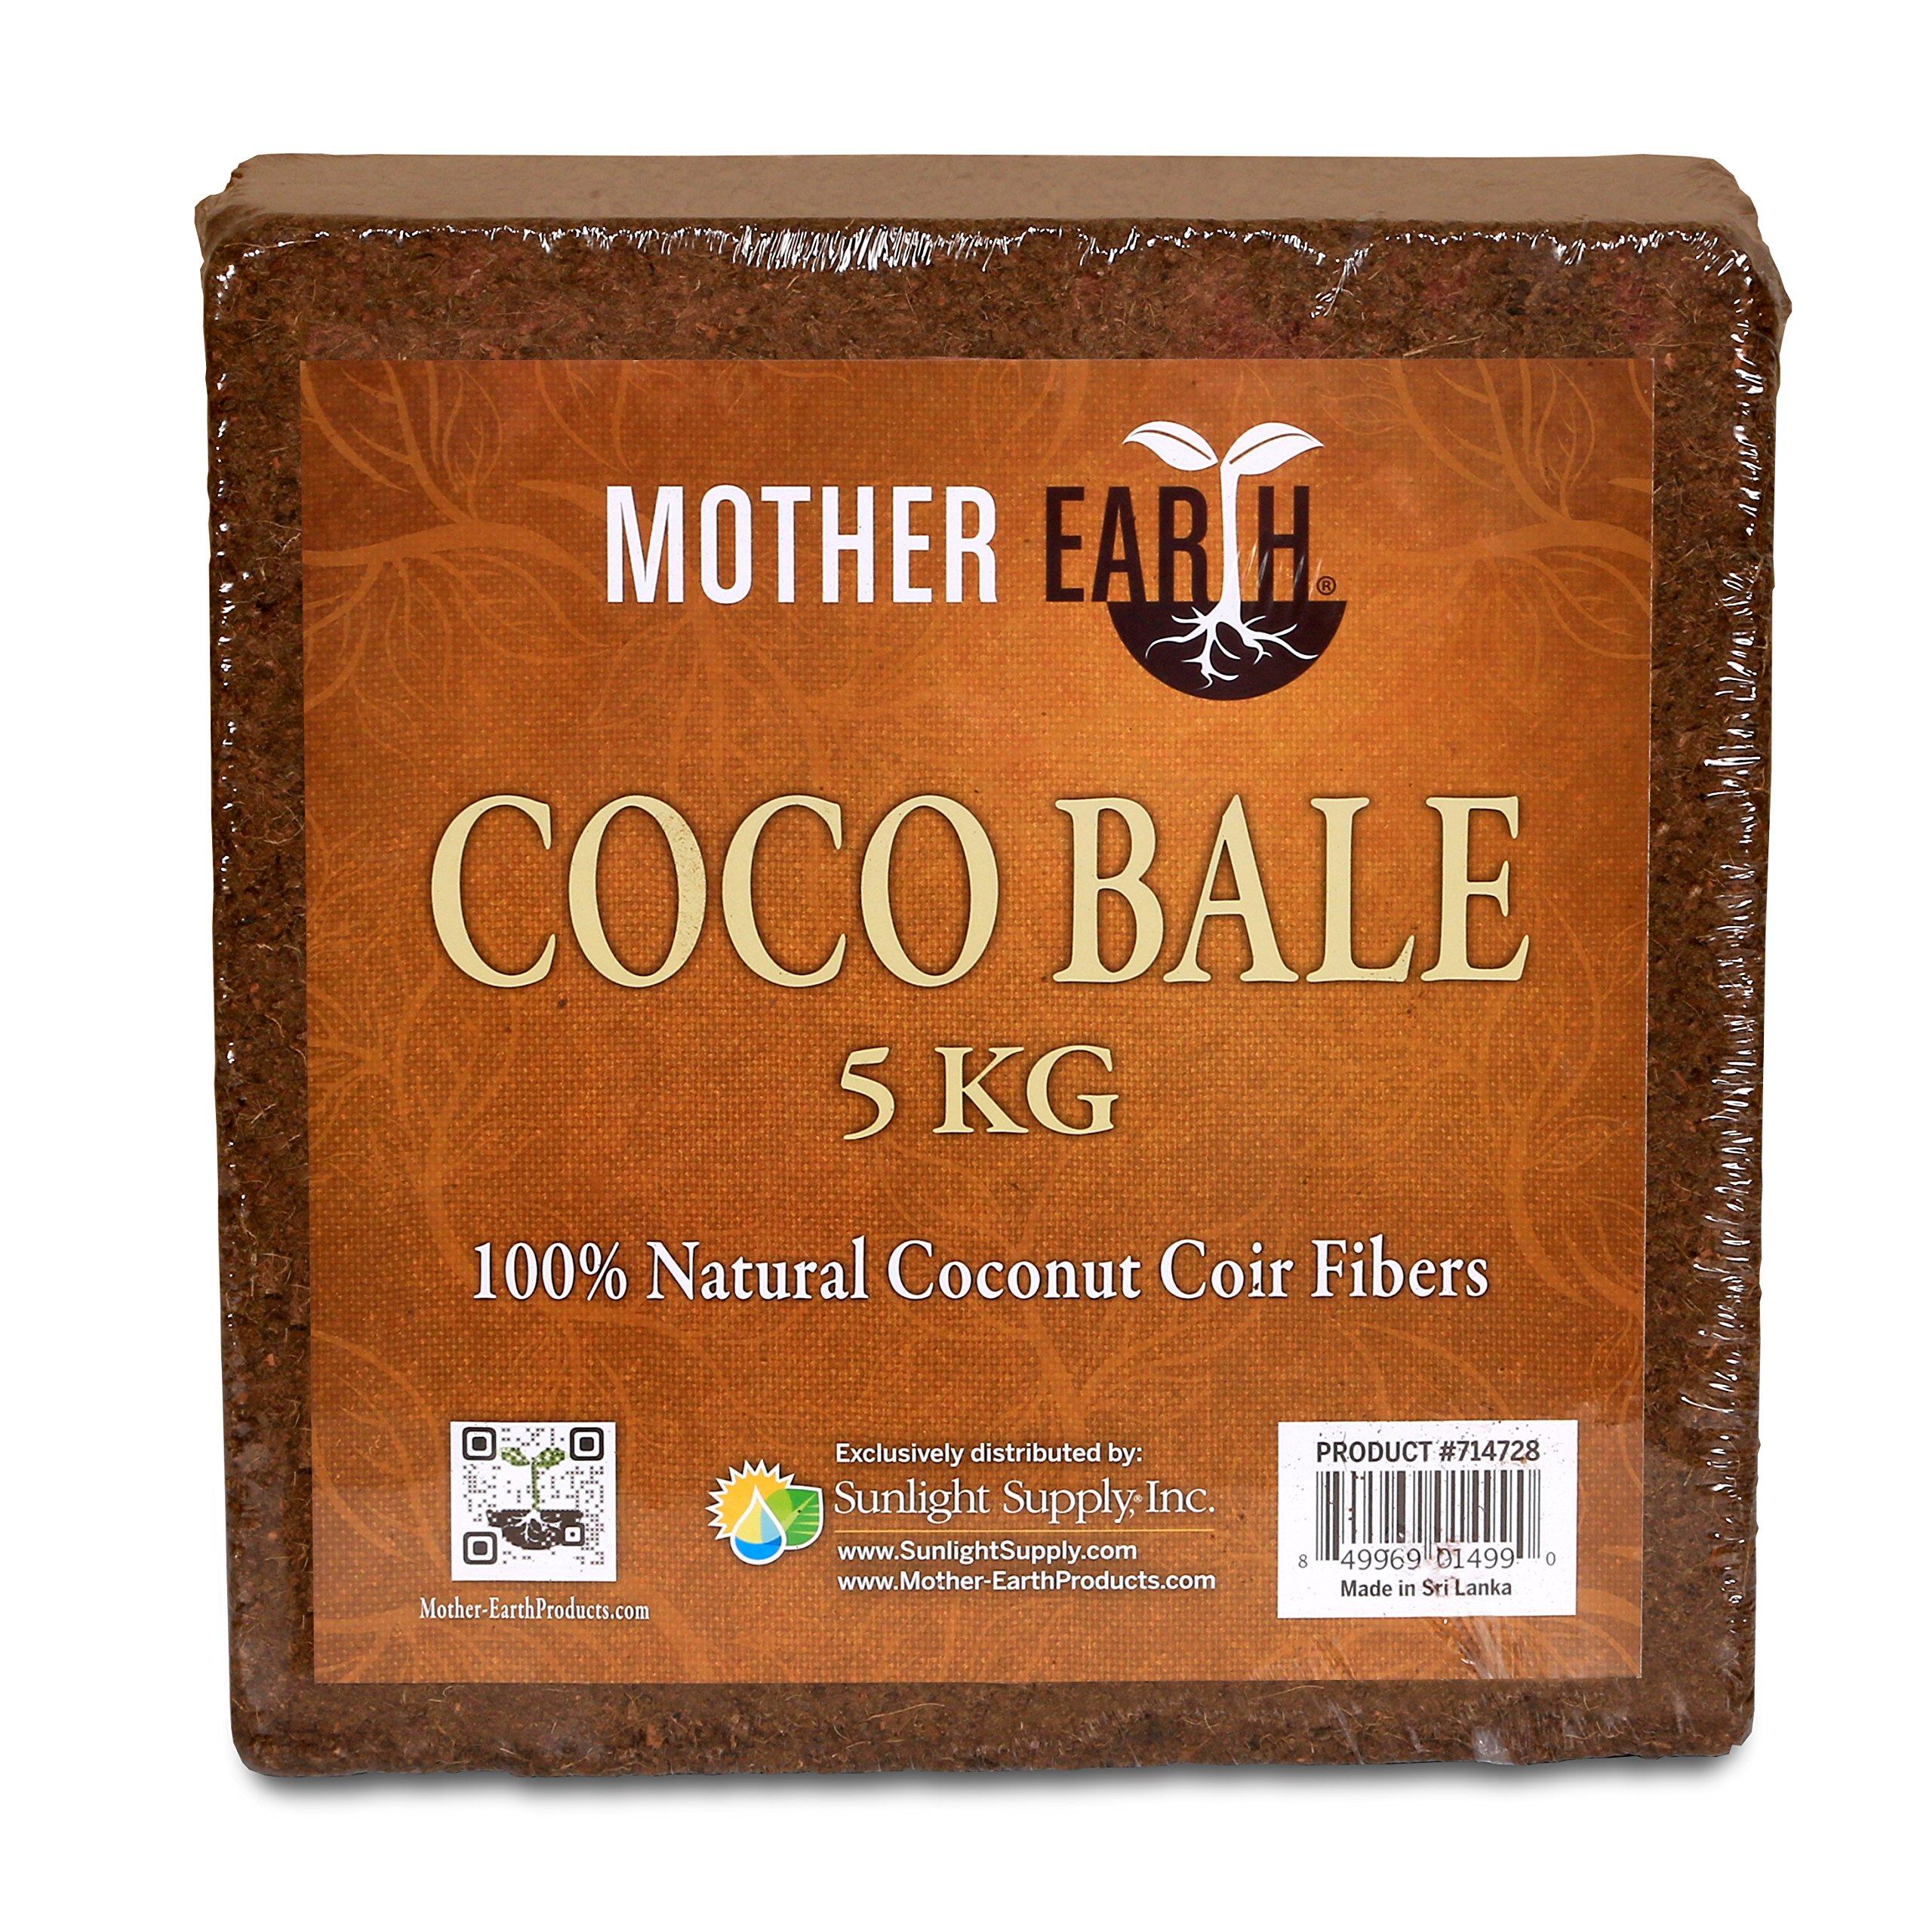 Mother Earth Coco Bale | 5kg | 100% Natural Coconut Fiber